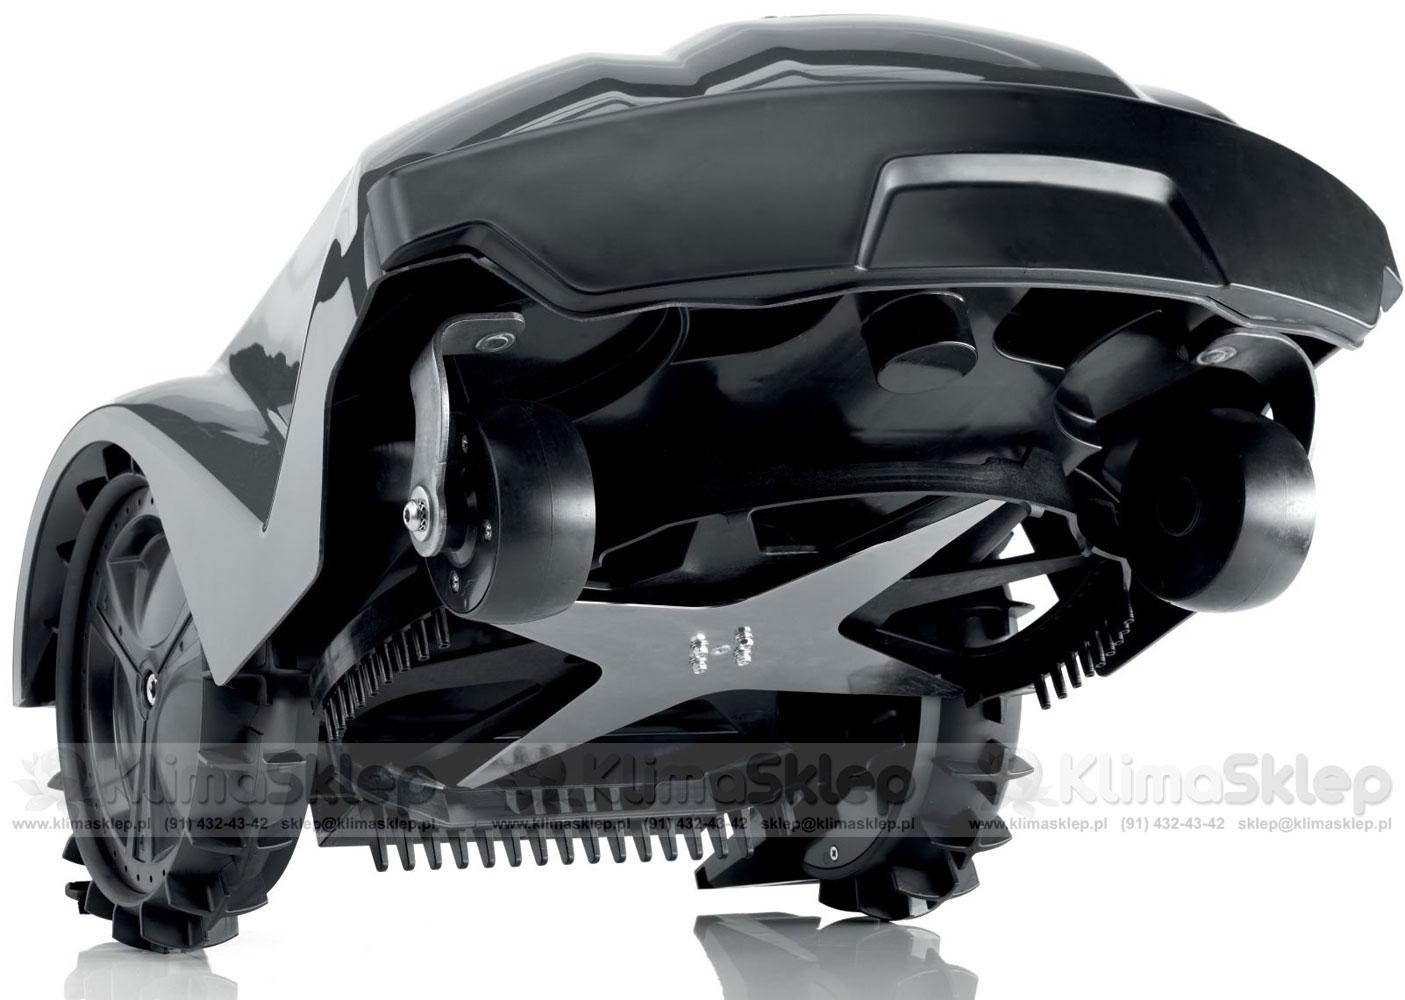 Robot Stiga Autoclip 720 S - ostrze